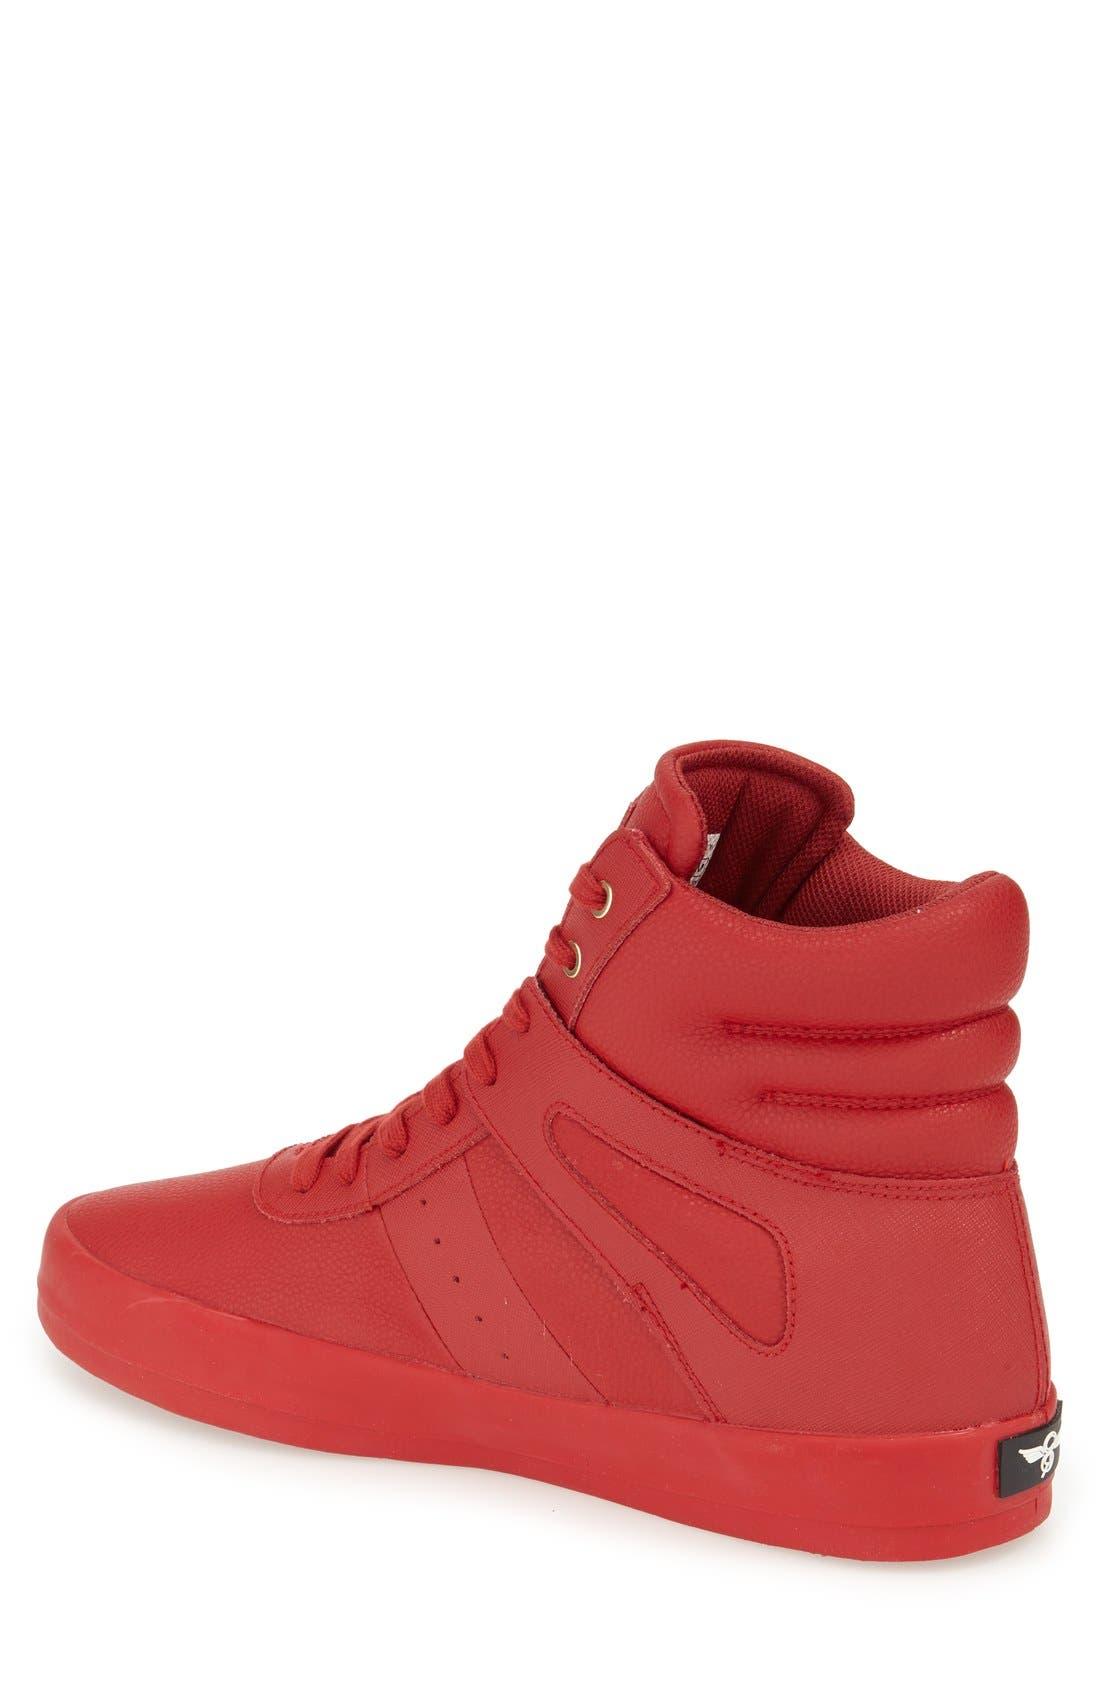 'Moretti' Sneaker,                             Alternate thumbnail 8, color,